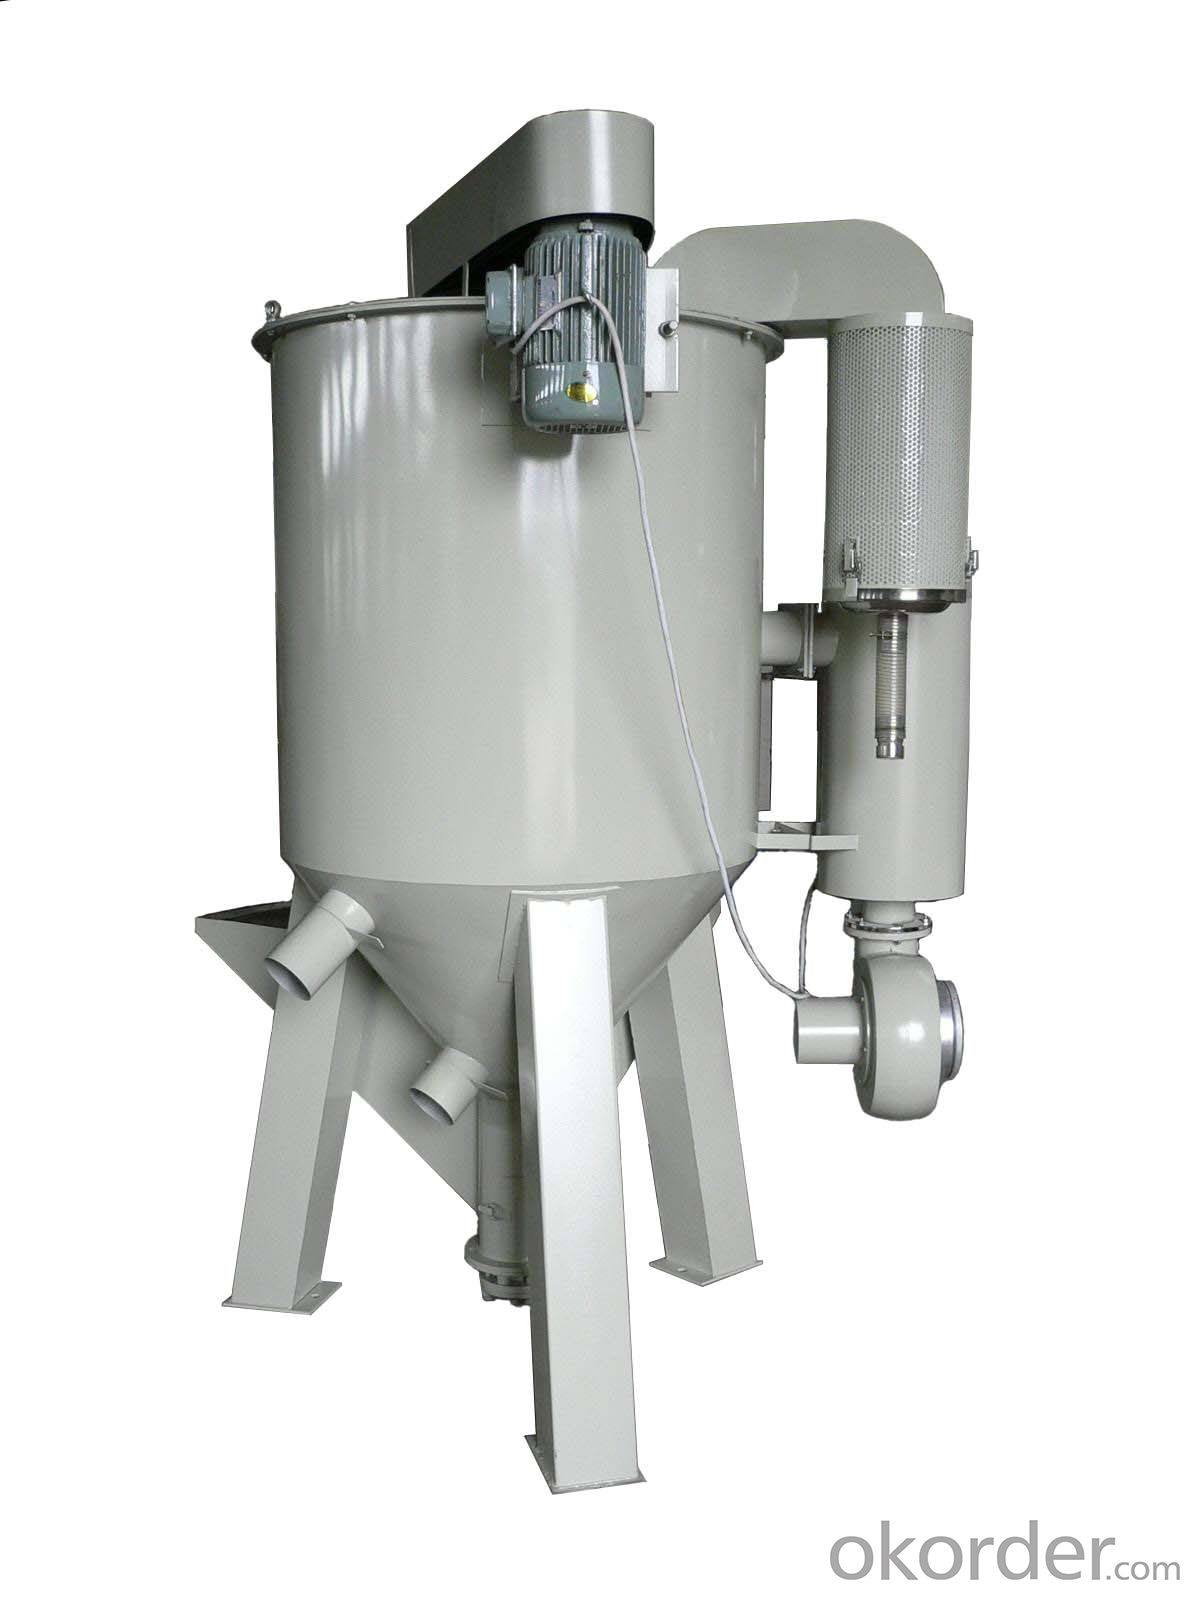 Buy Plastic Hopper Dryer Plastics Drying Mixer Price Size